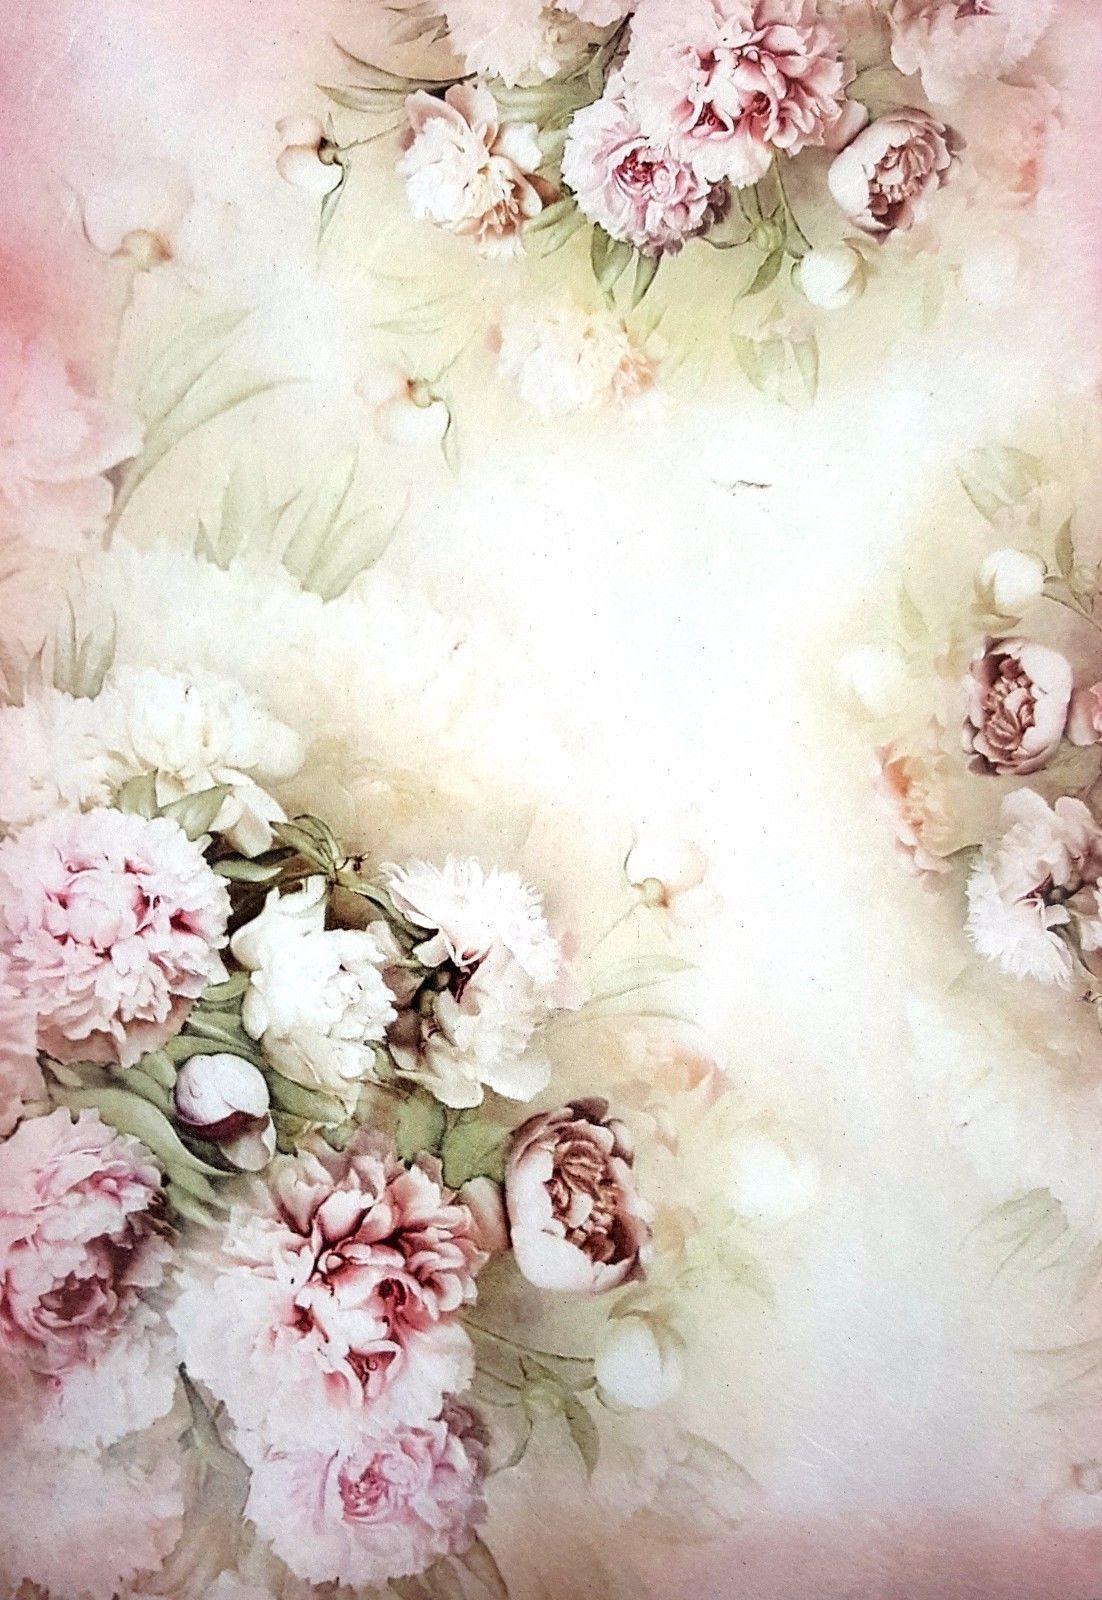 Rice Paper for Decoupage Scrapbooking Sheet Vintage Rose Bouquet